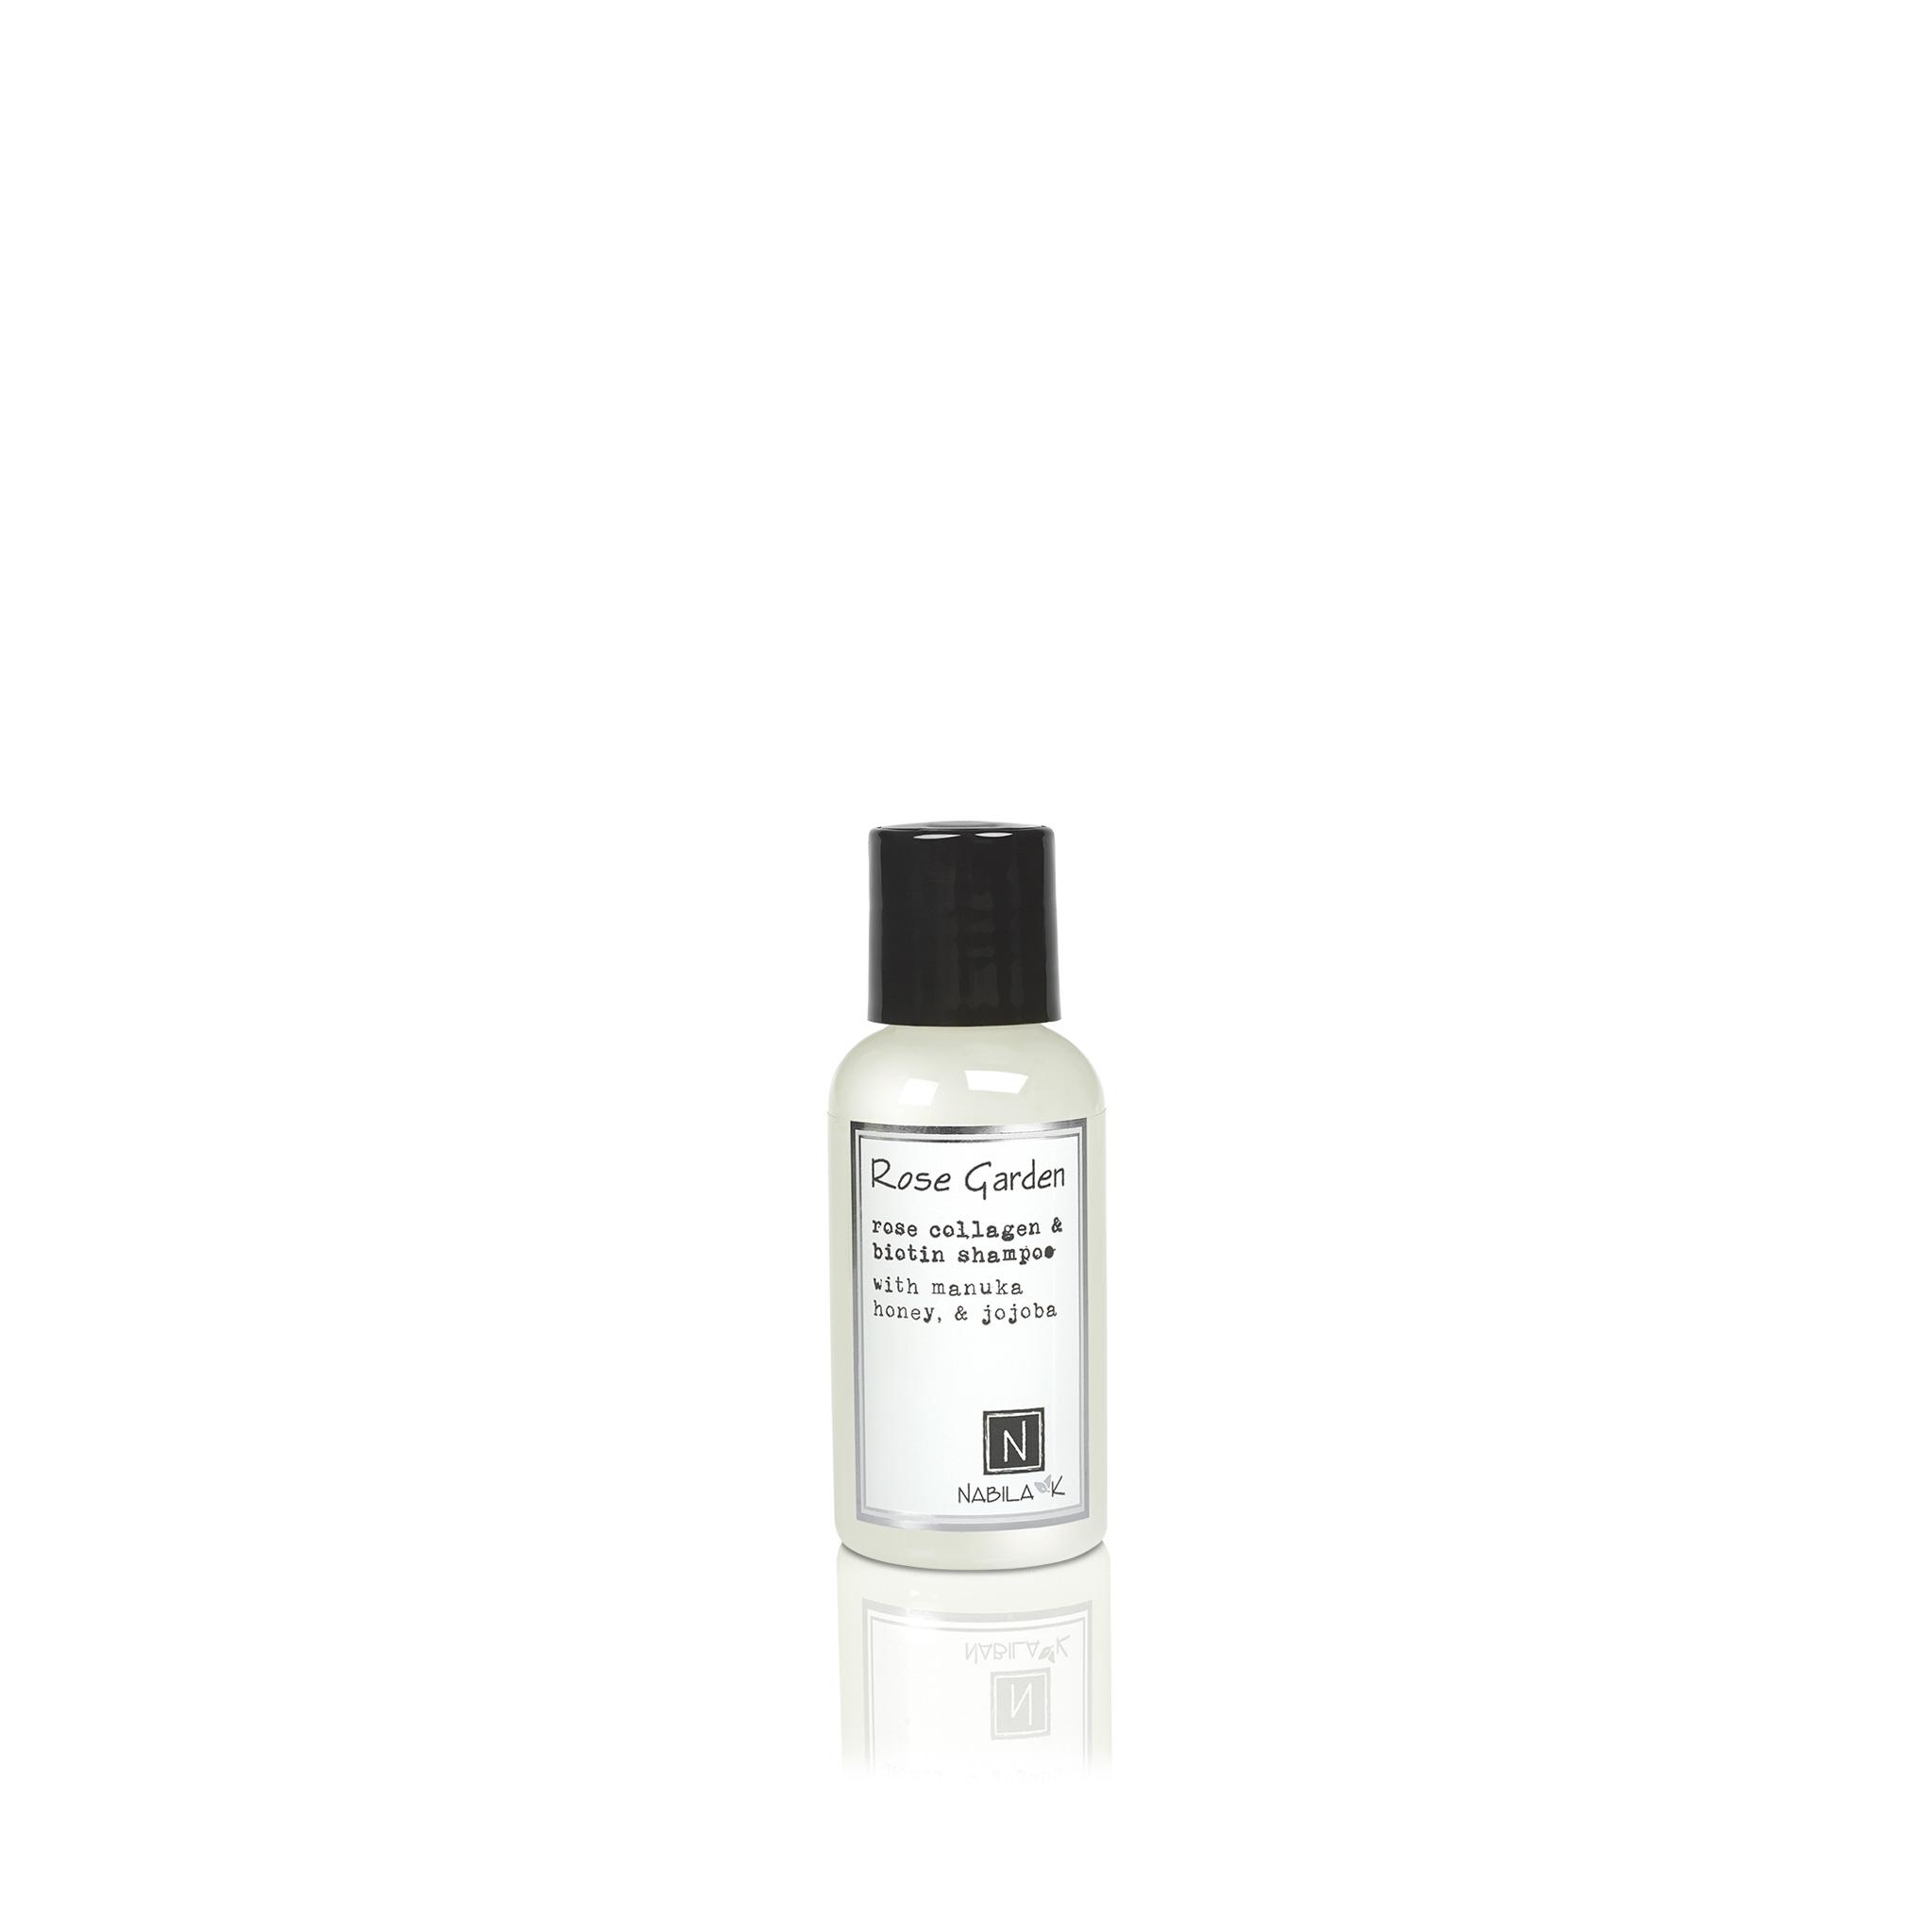 1 Travel Sized Bottle of Nabila K's Rose Garden Rose Collagen and Biotin Shampoo with Maunka Honey and Jojoba